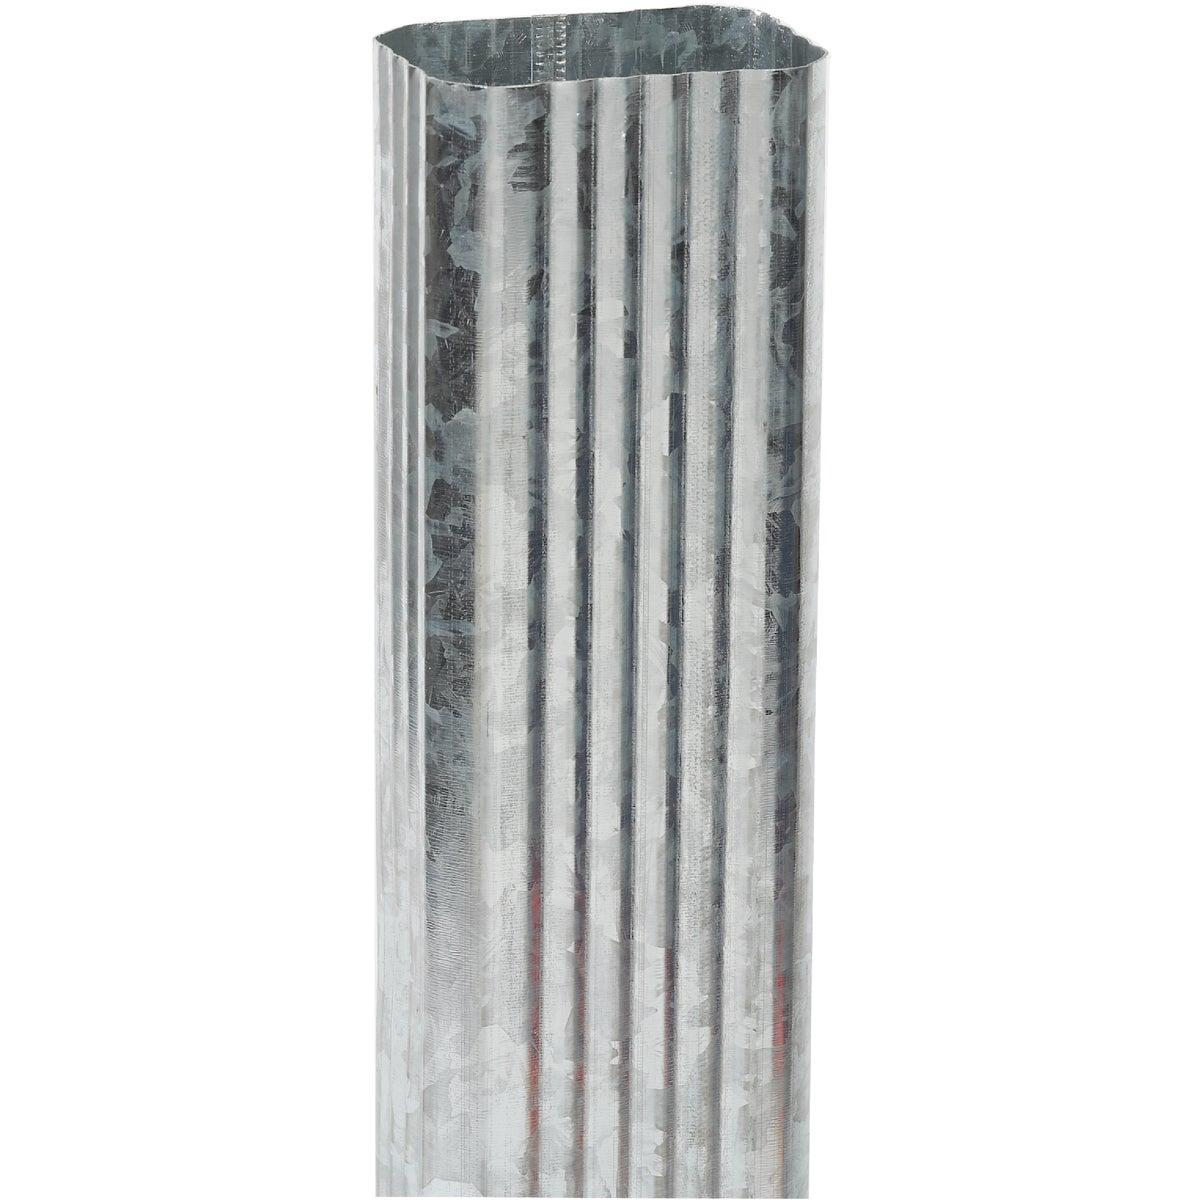 Galvanized Downspout